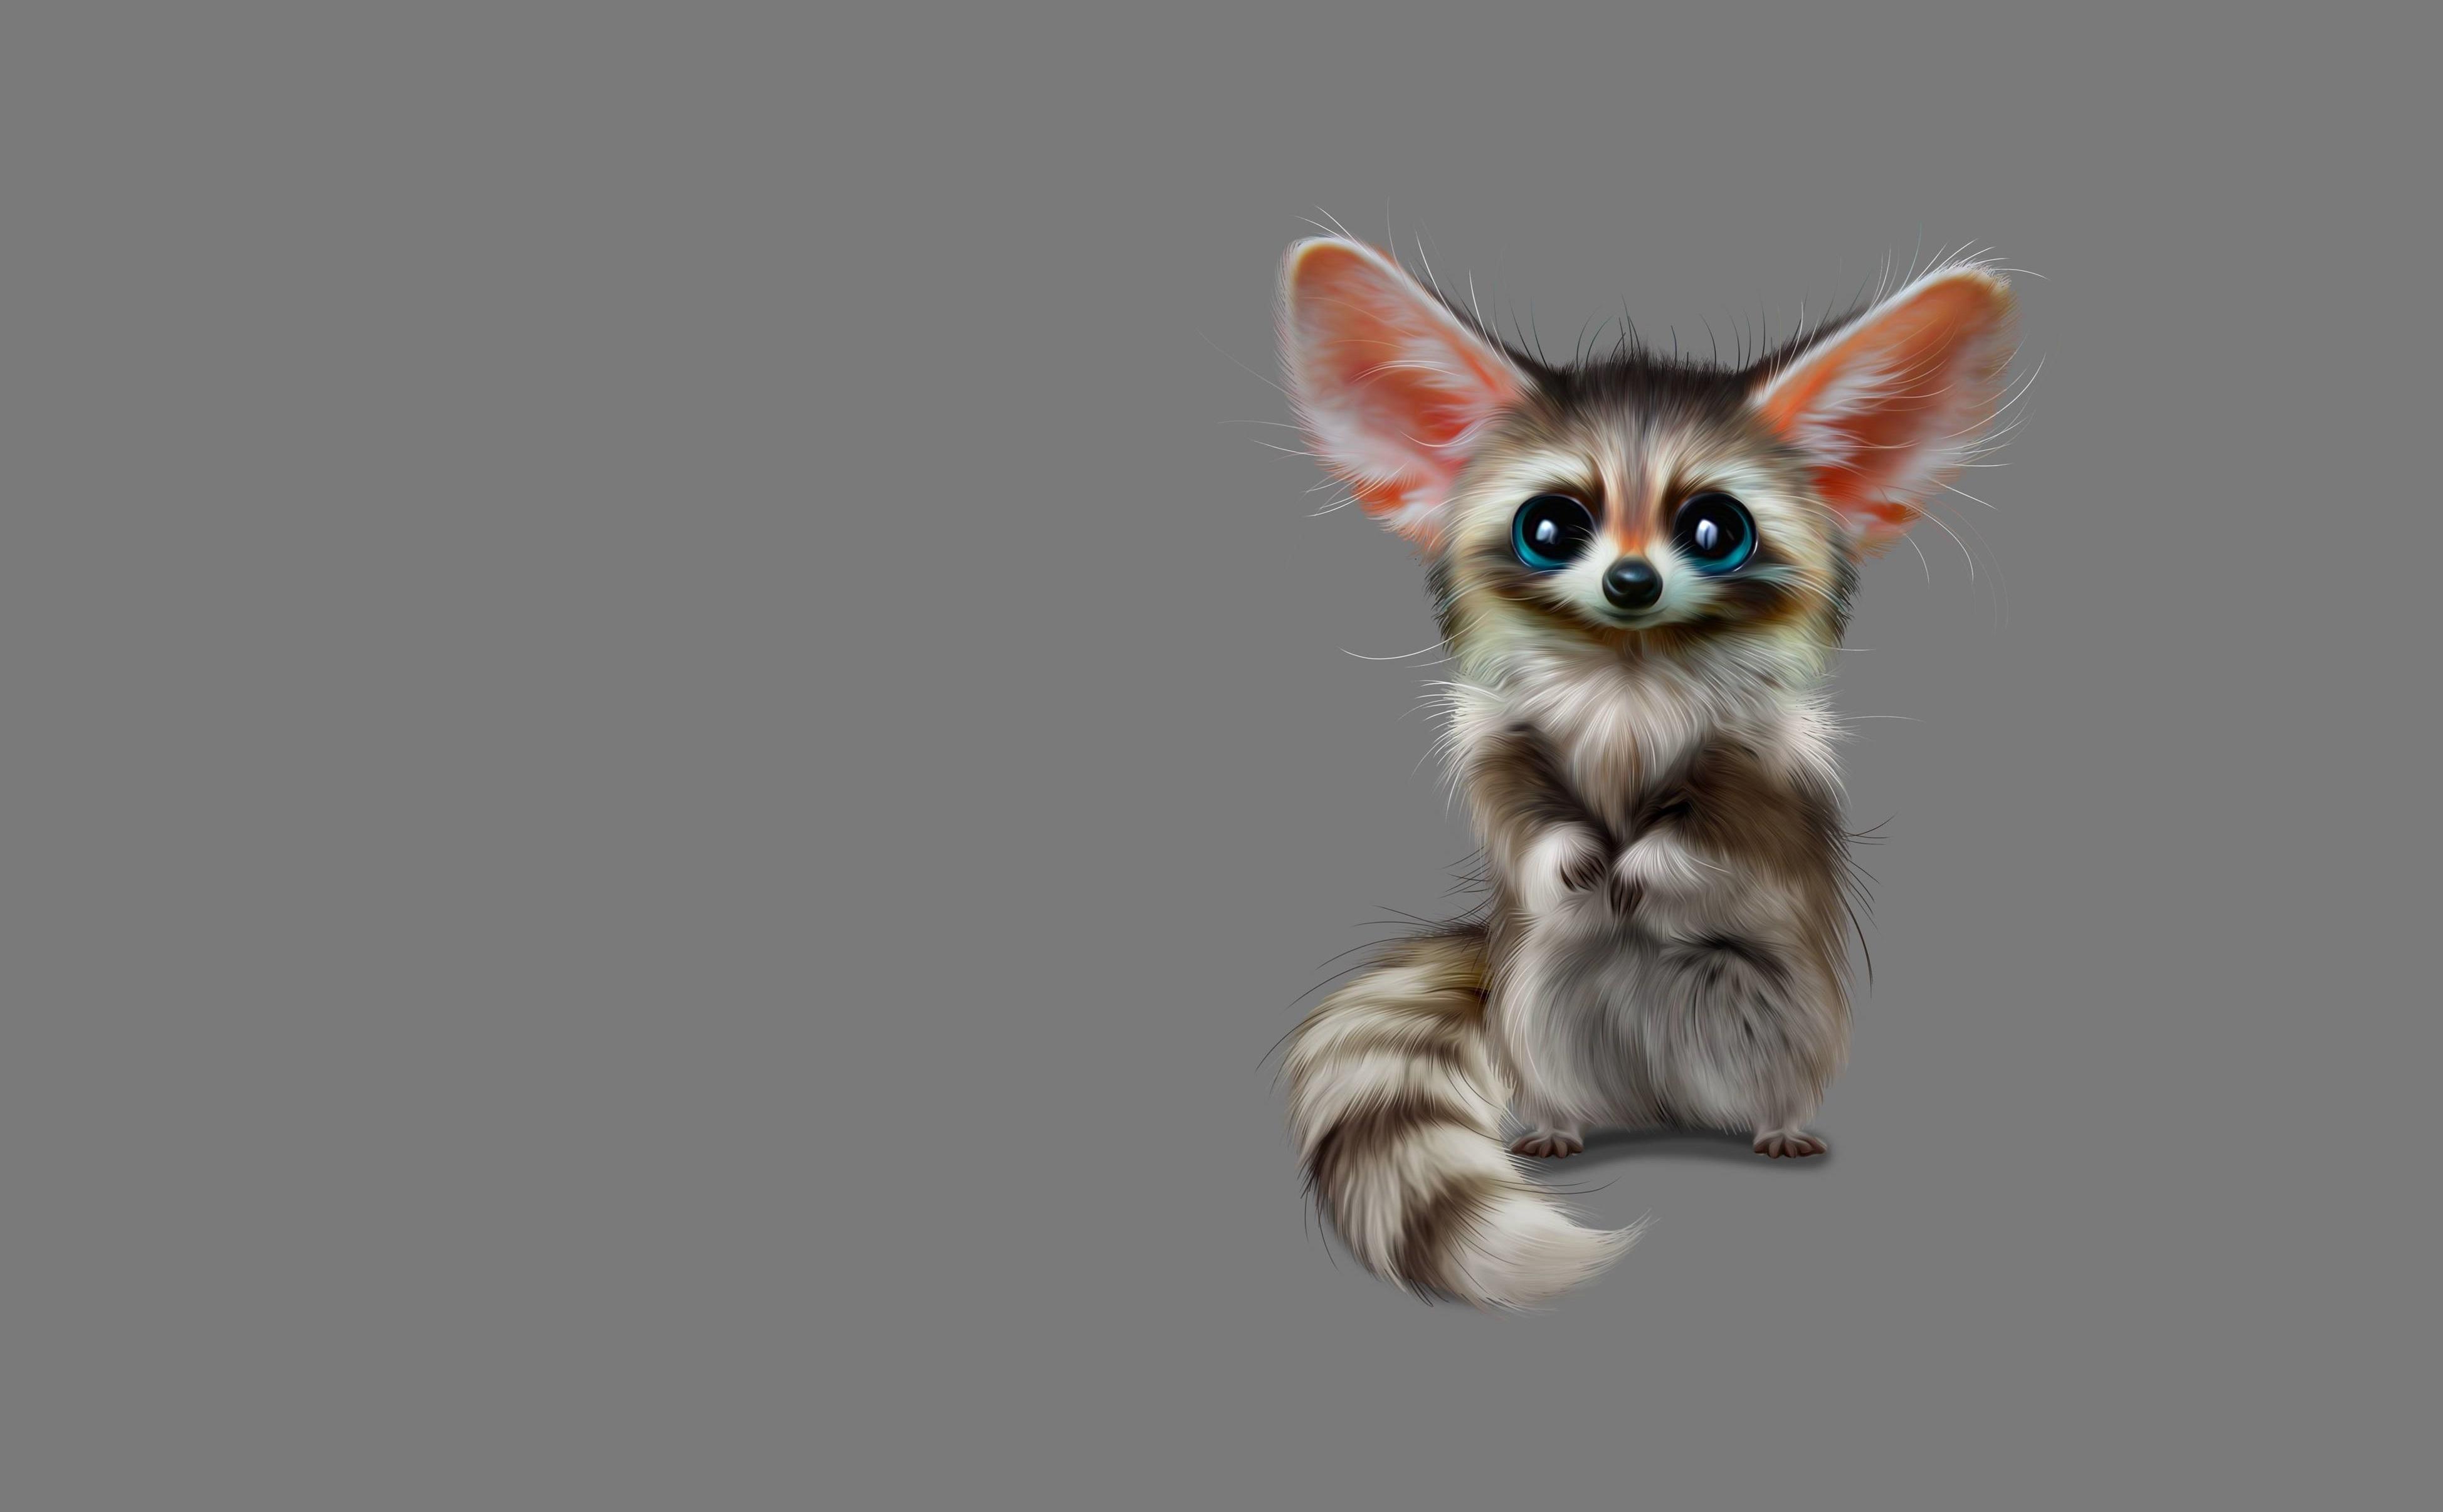 Animal With Big Eyes Art pc wallpaper